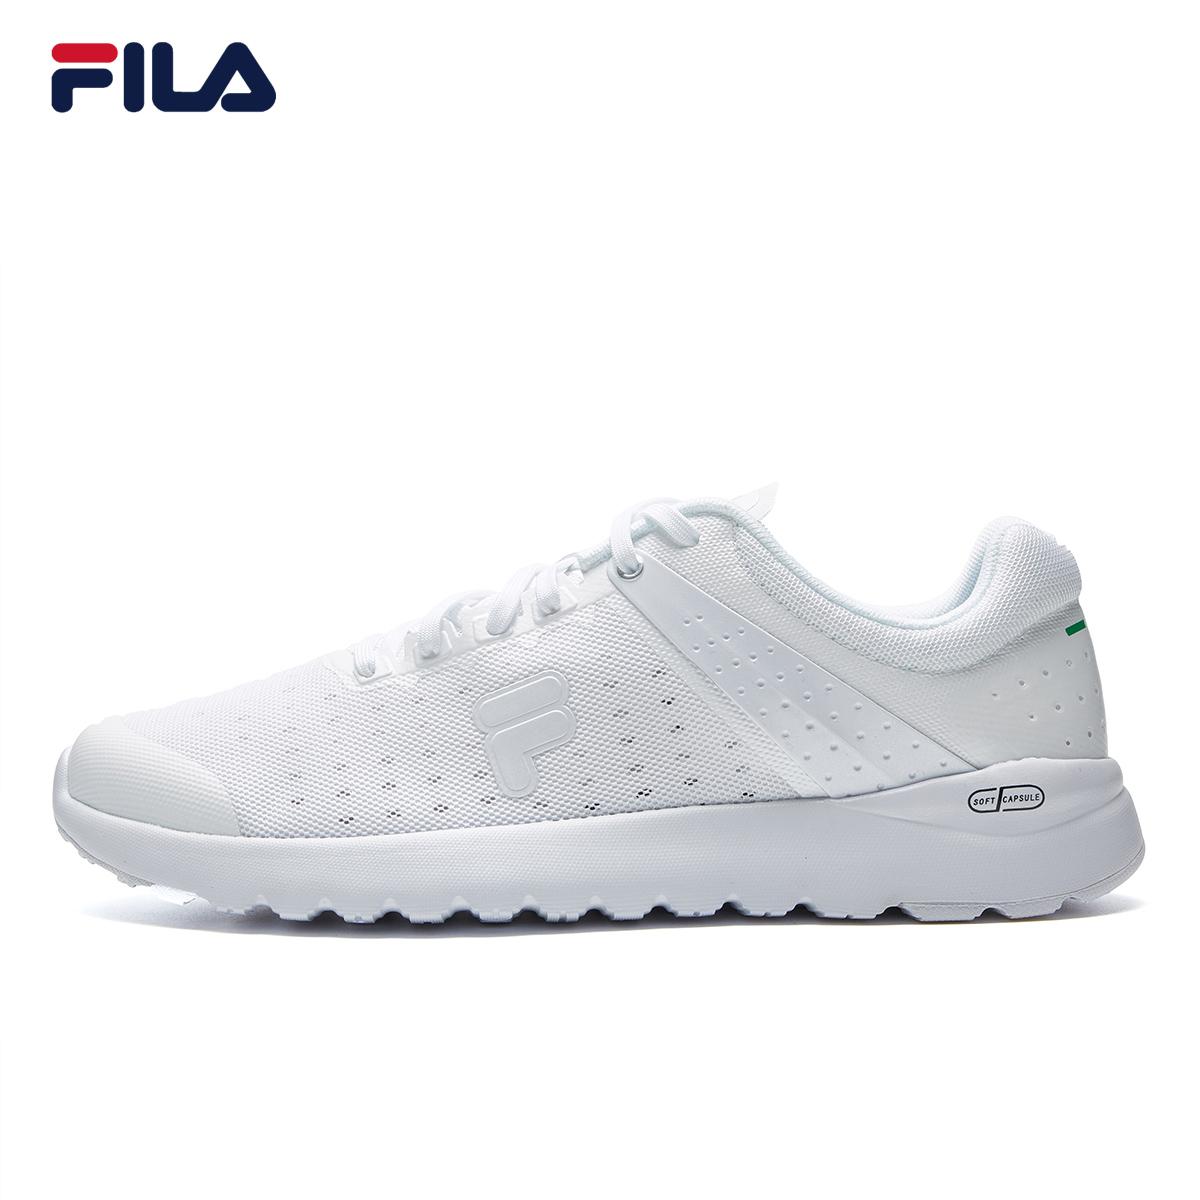 FILA斐乐男综训鞋2018透气轻便运动休闲健身训练跑步鞋舒适男跑鞋